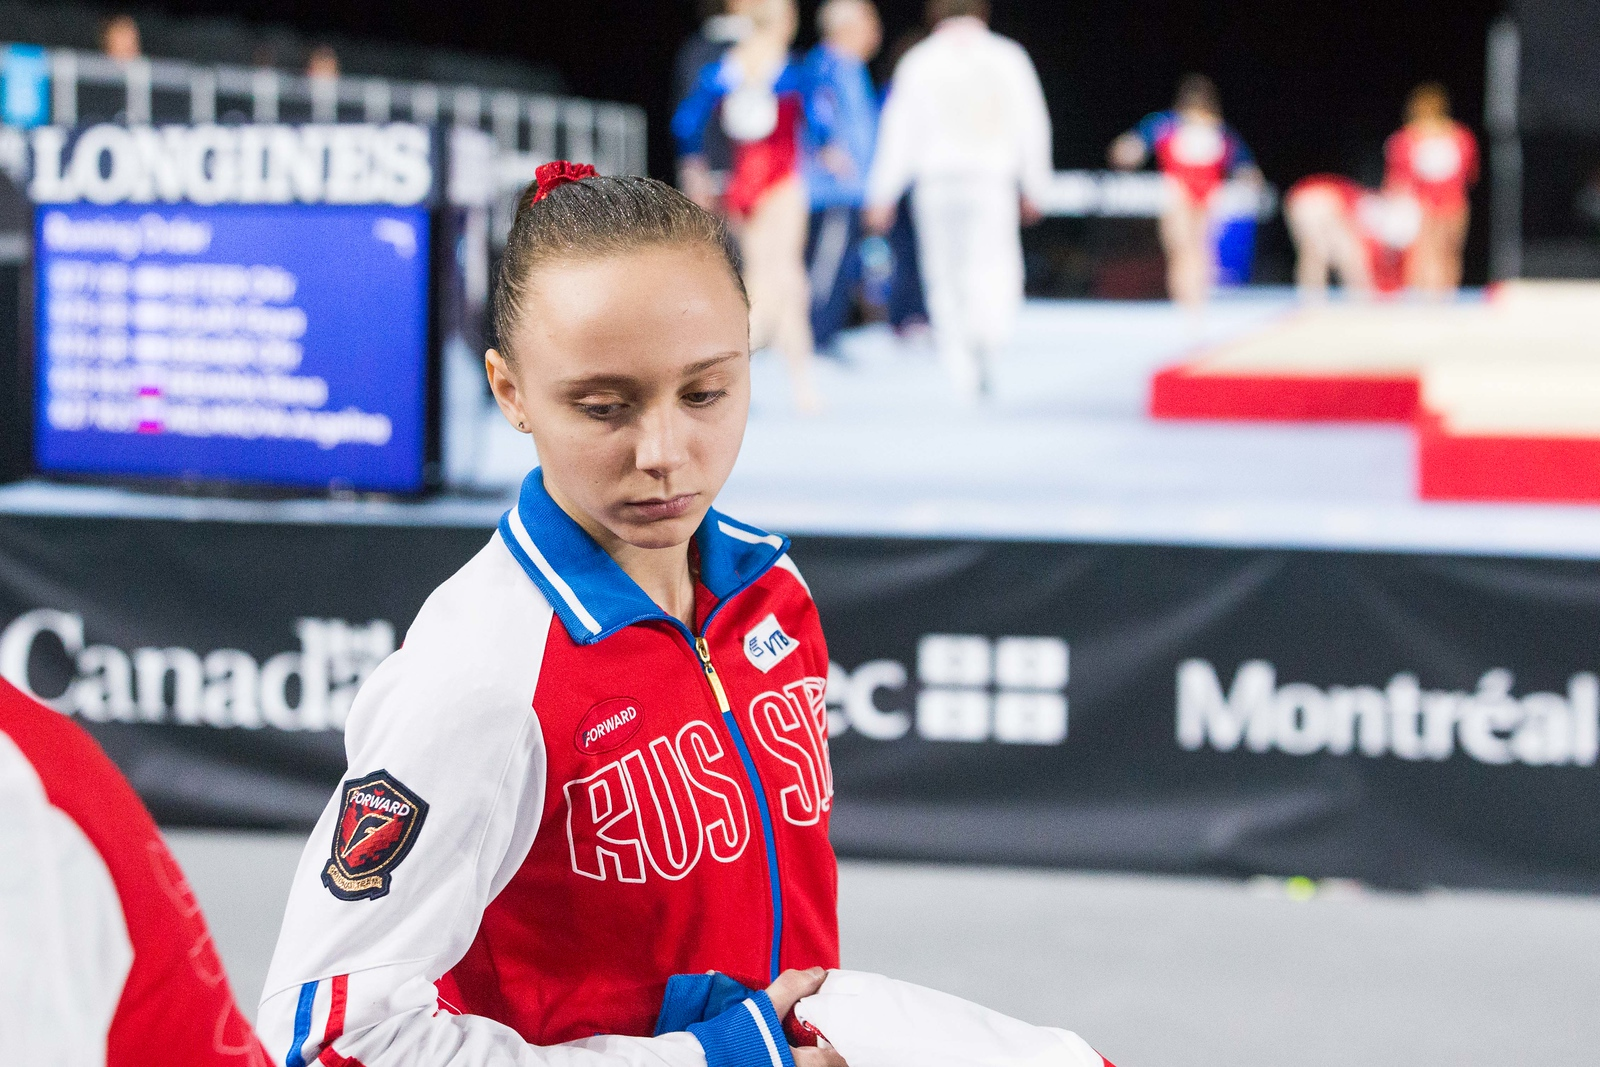 FIG 2017:  World Artistic Gymnastics Championships, Women's Qualifications October 03